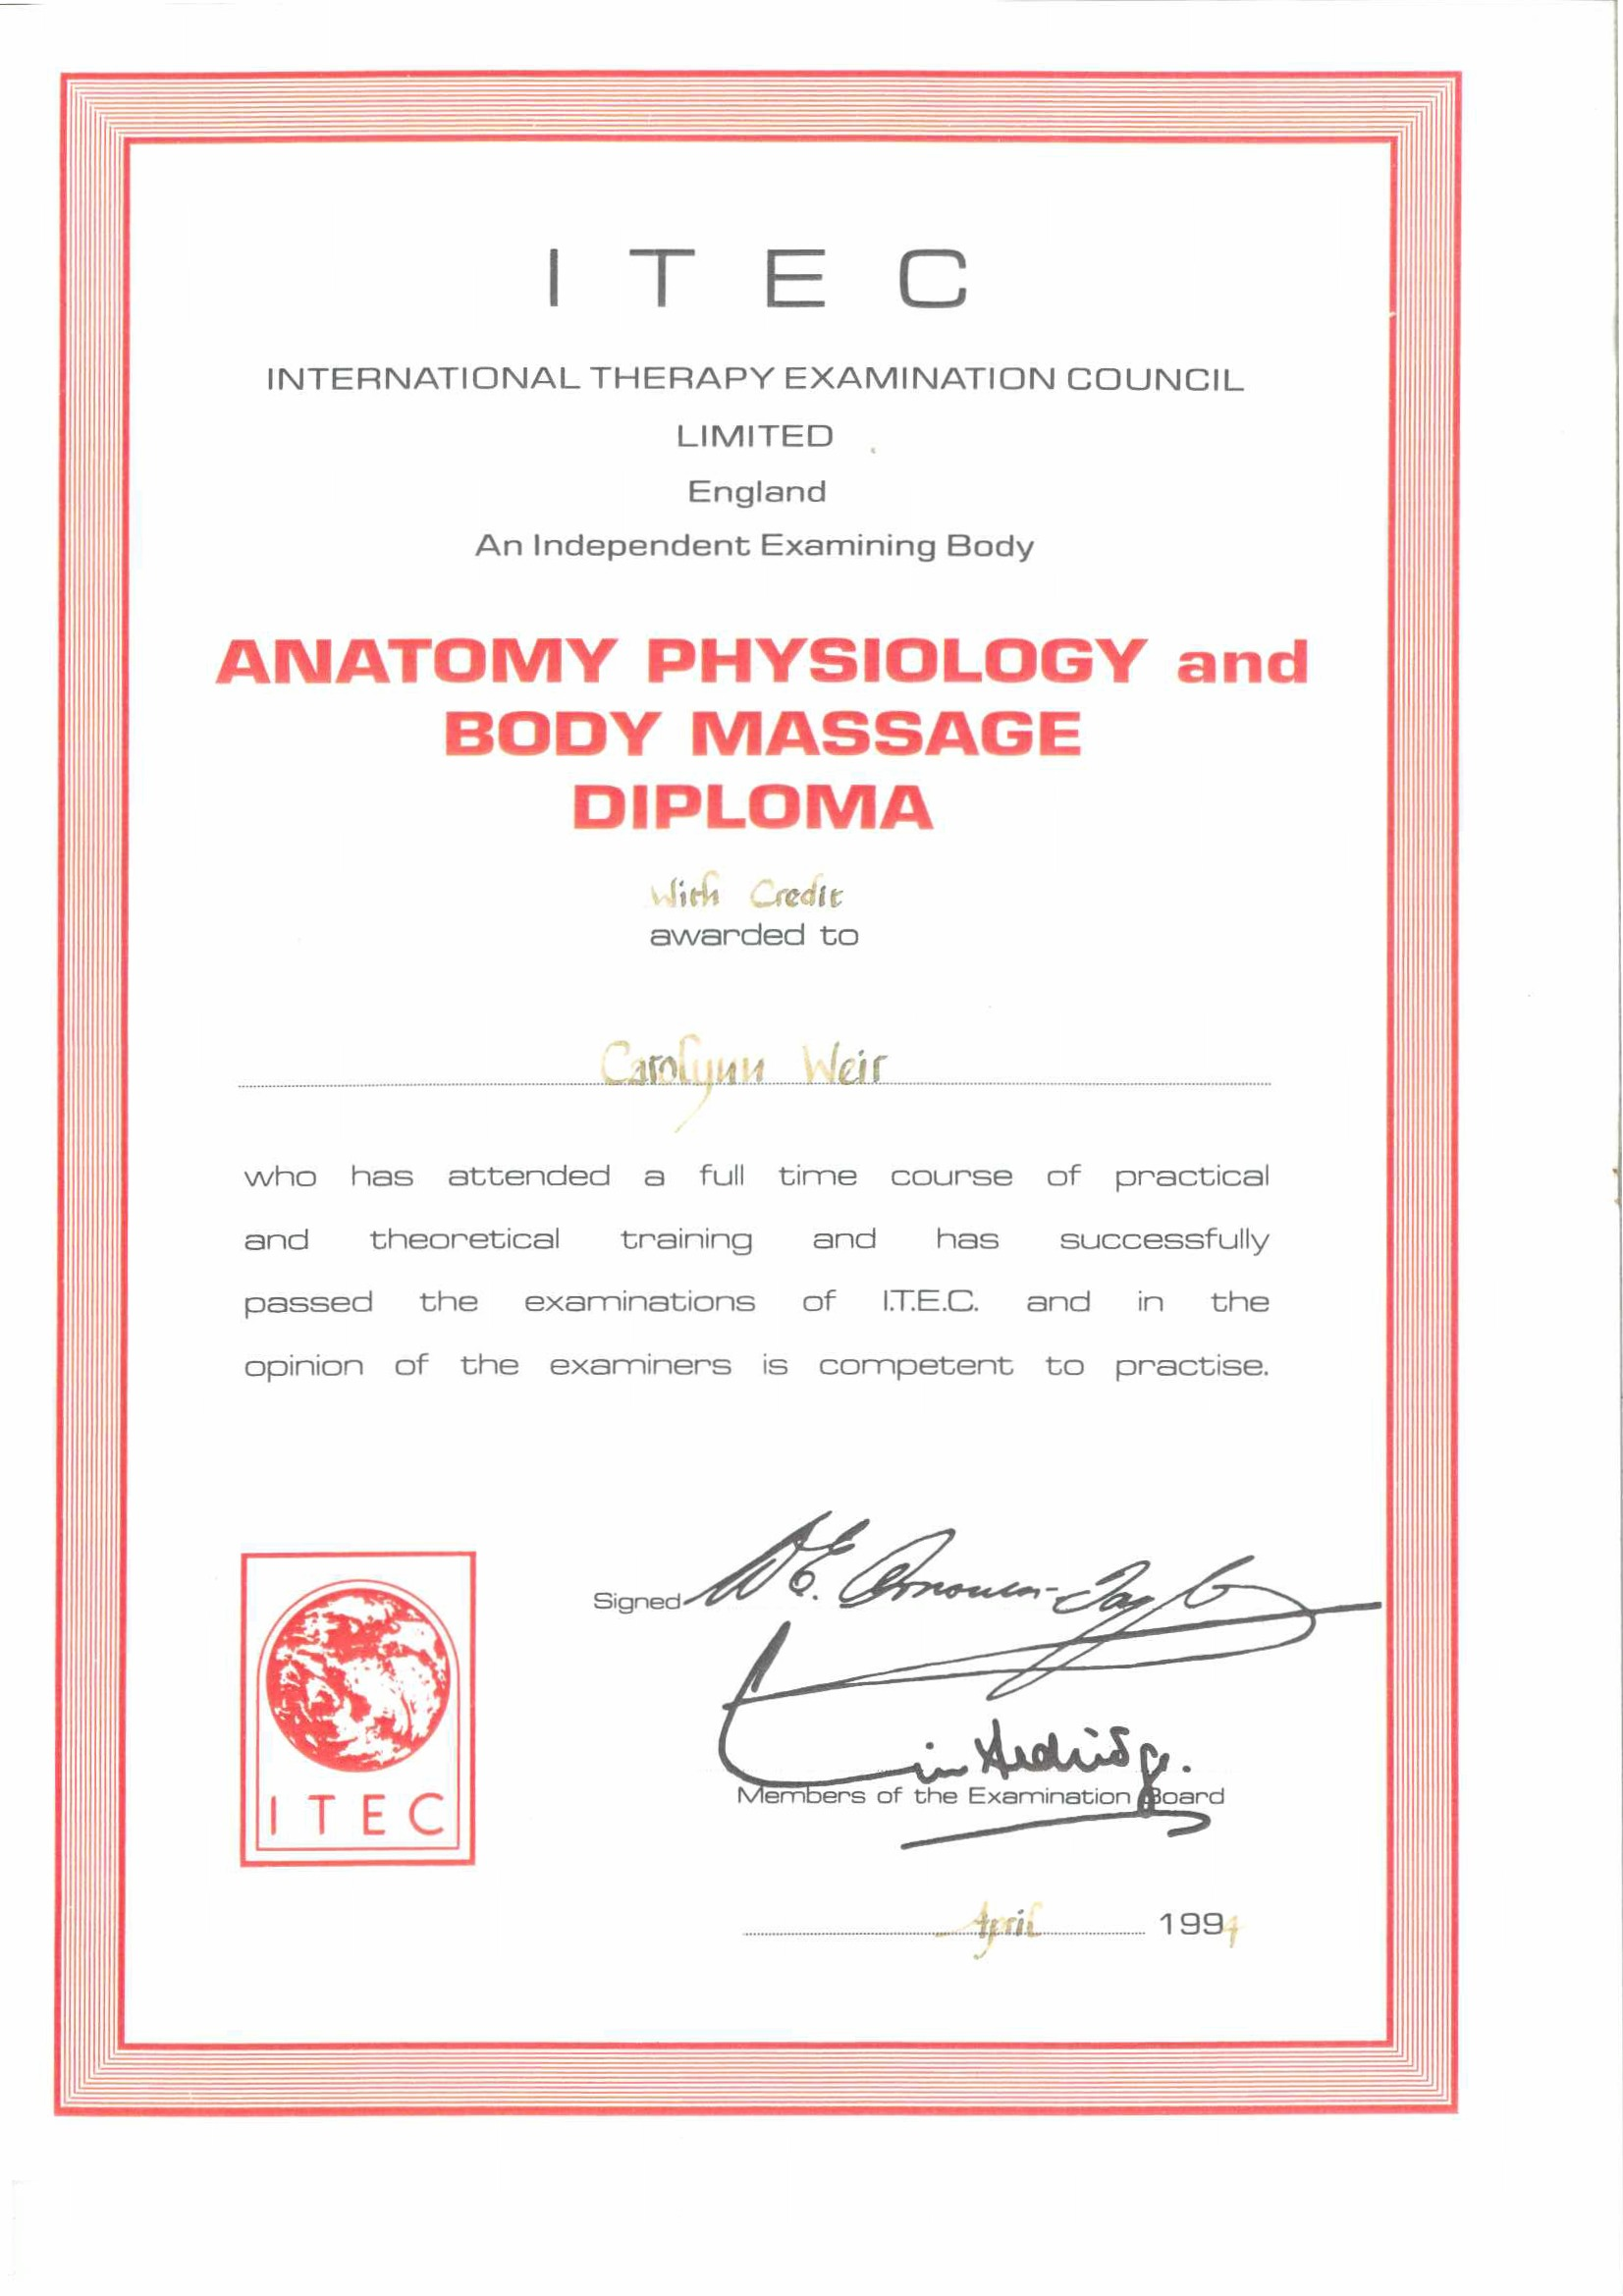 Certificate for ITEC